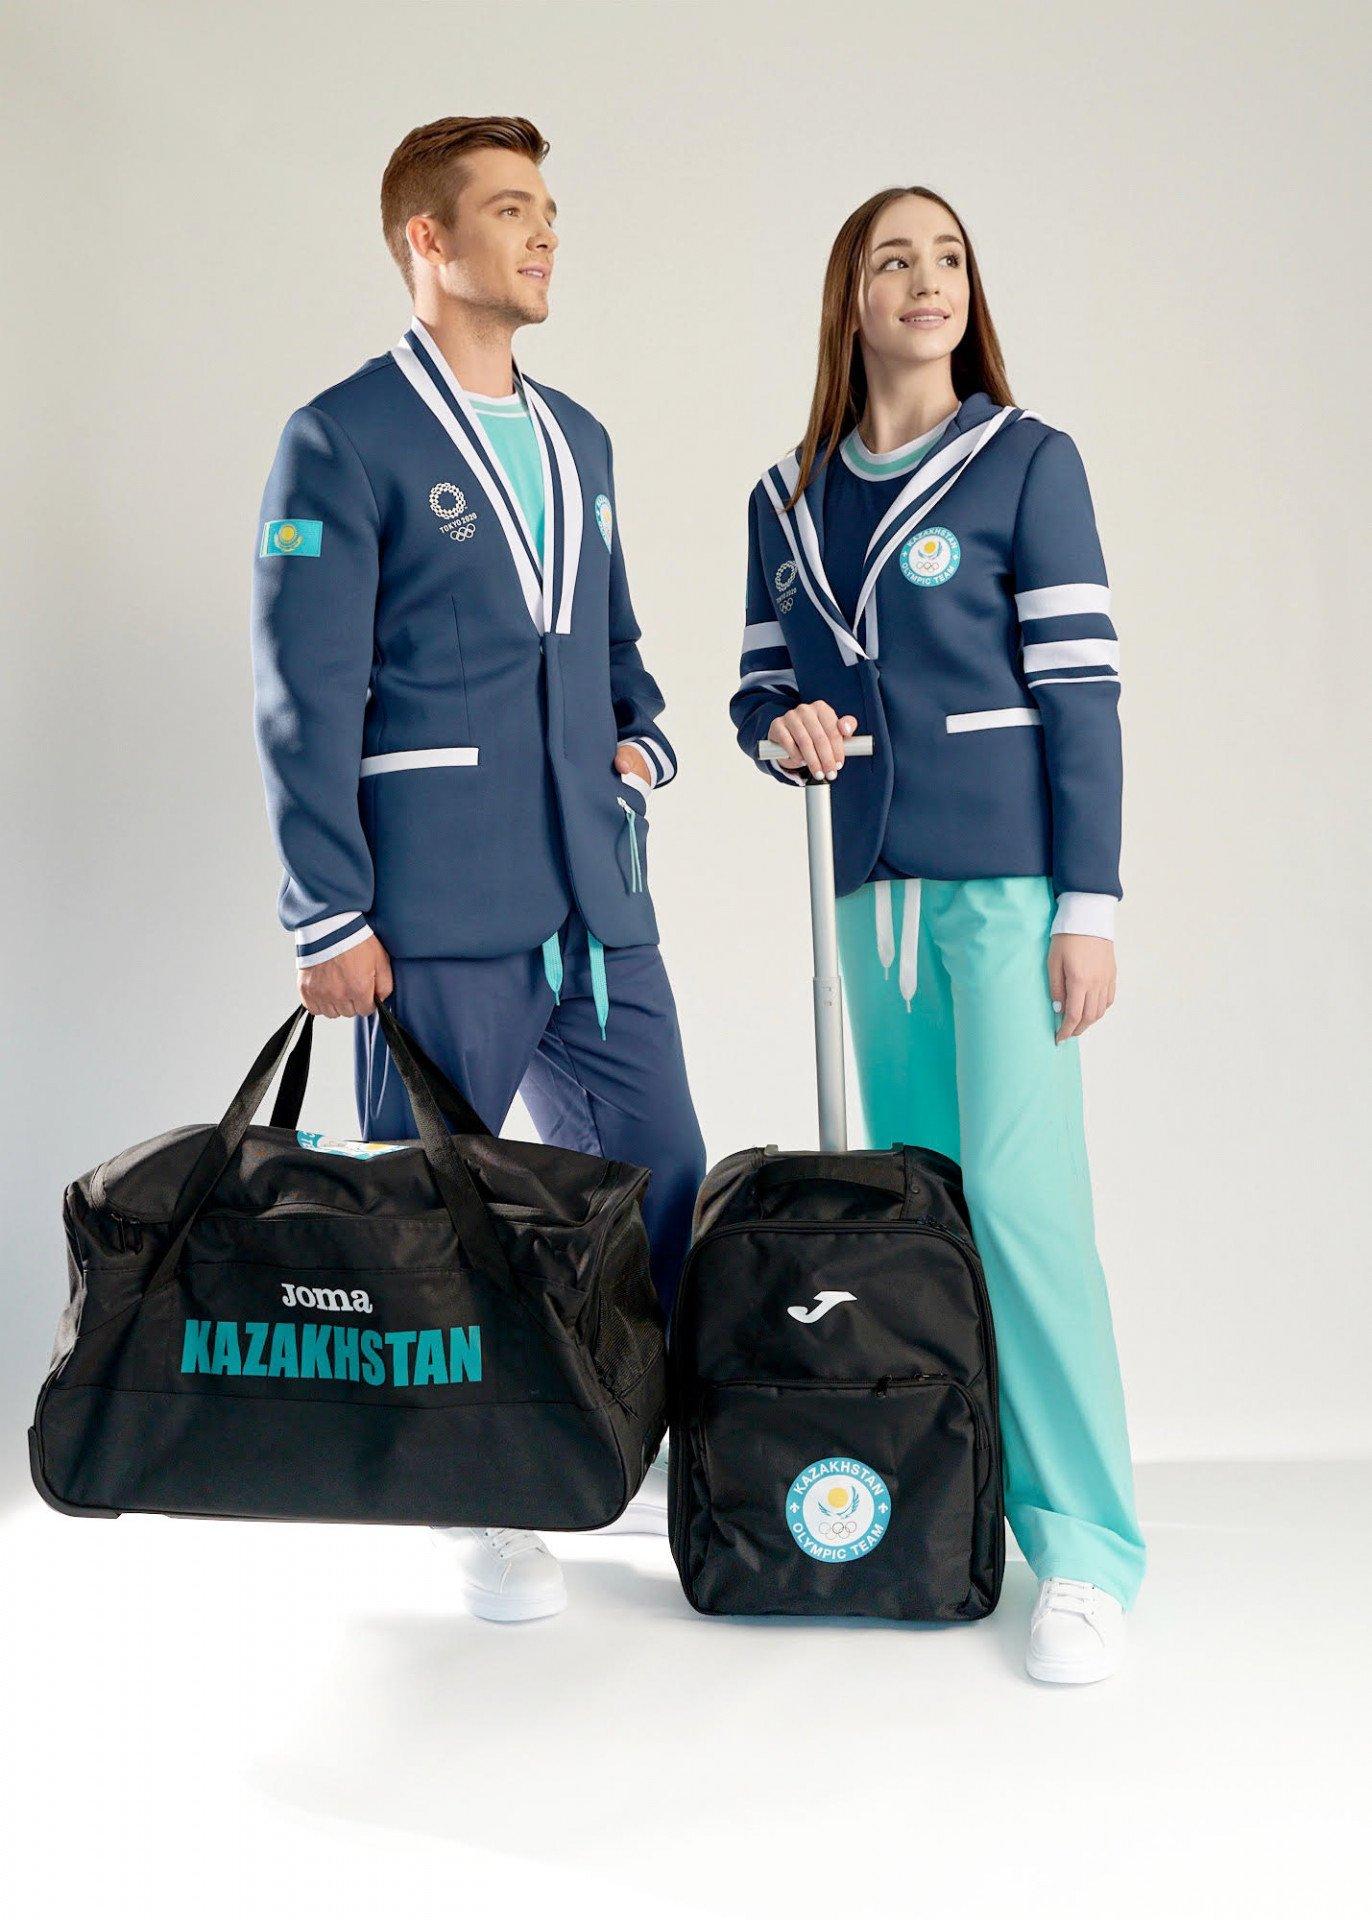 Новую олимпийскую форму казахстанских спортсменов представил НОК, фото-3